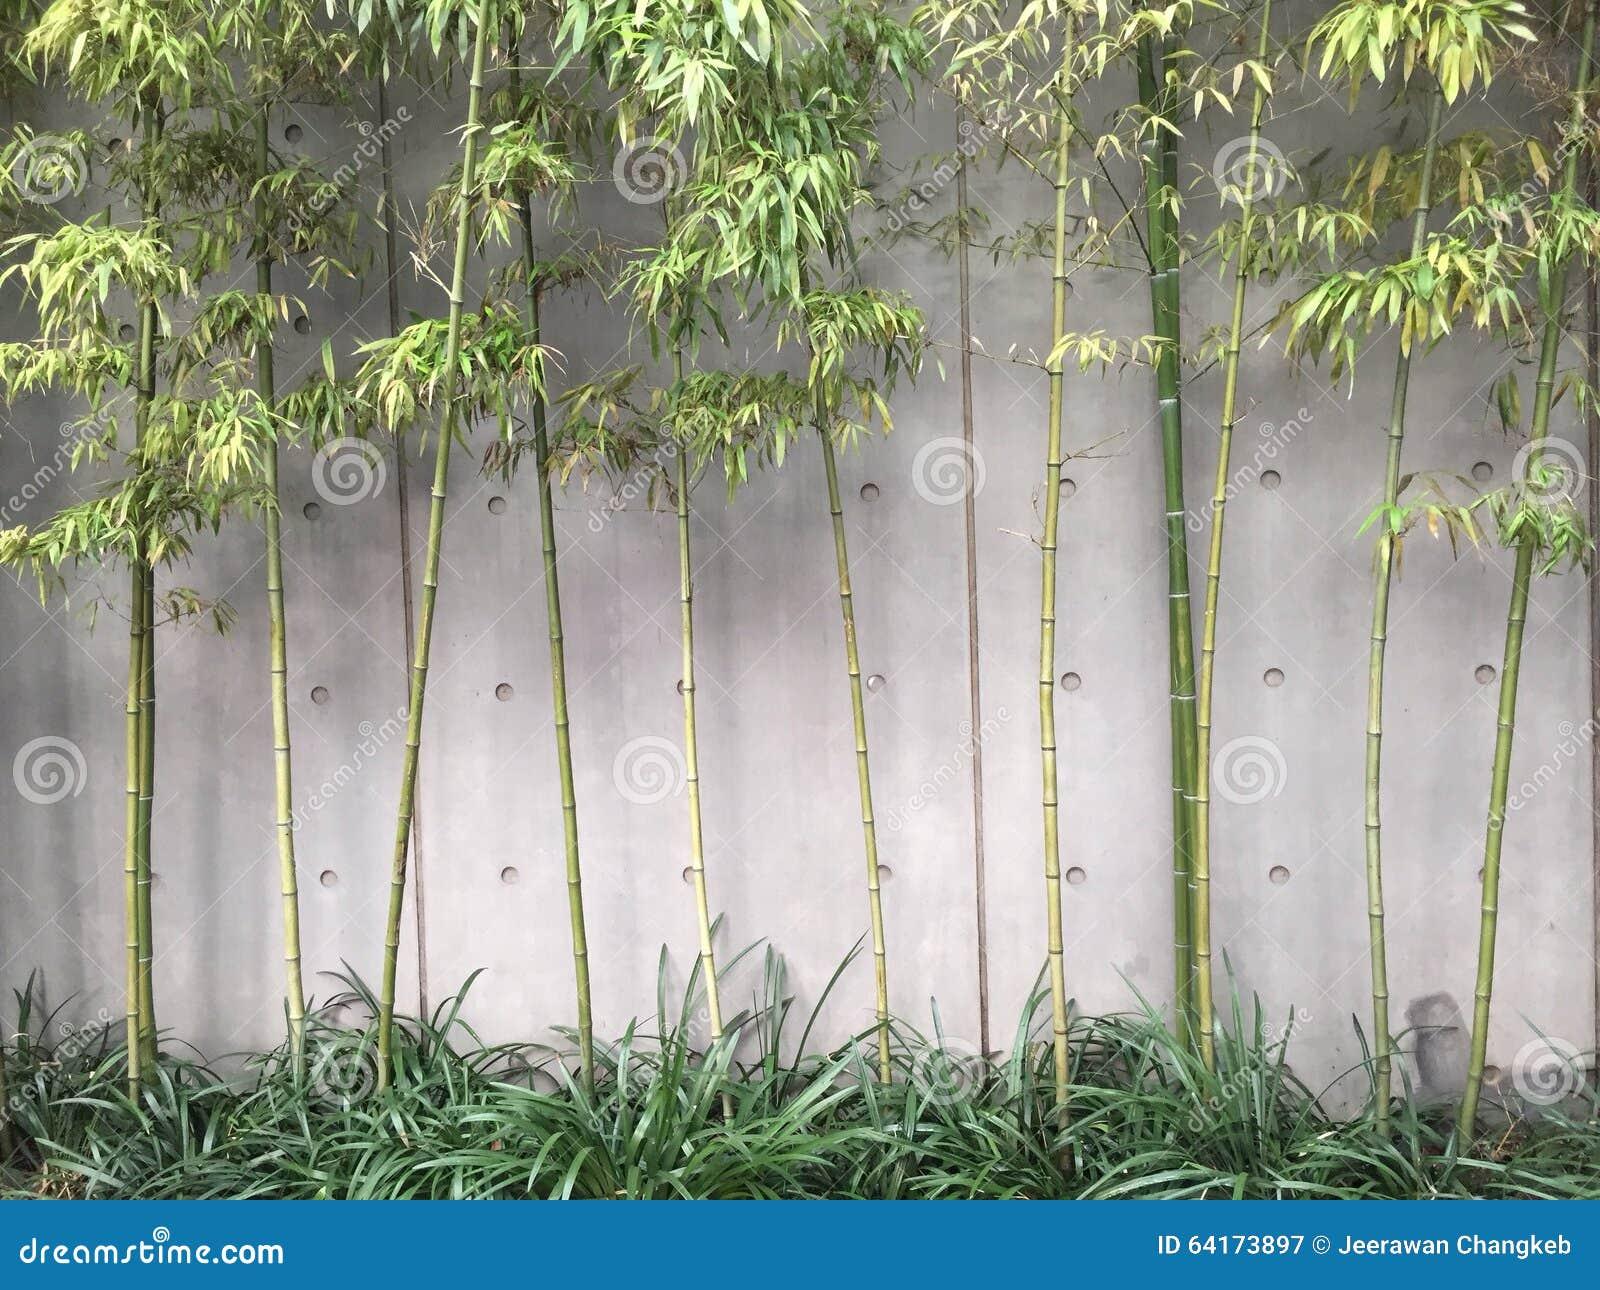 Garden bamboo modern style editorial photography image - Jardin de bambu talavera ...